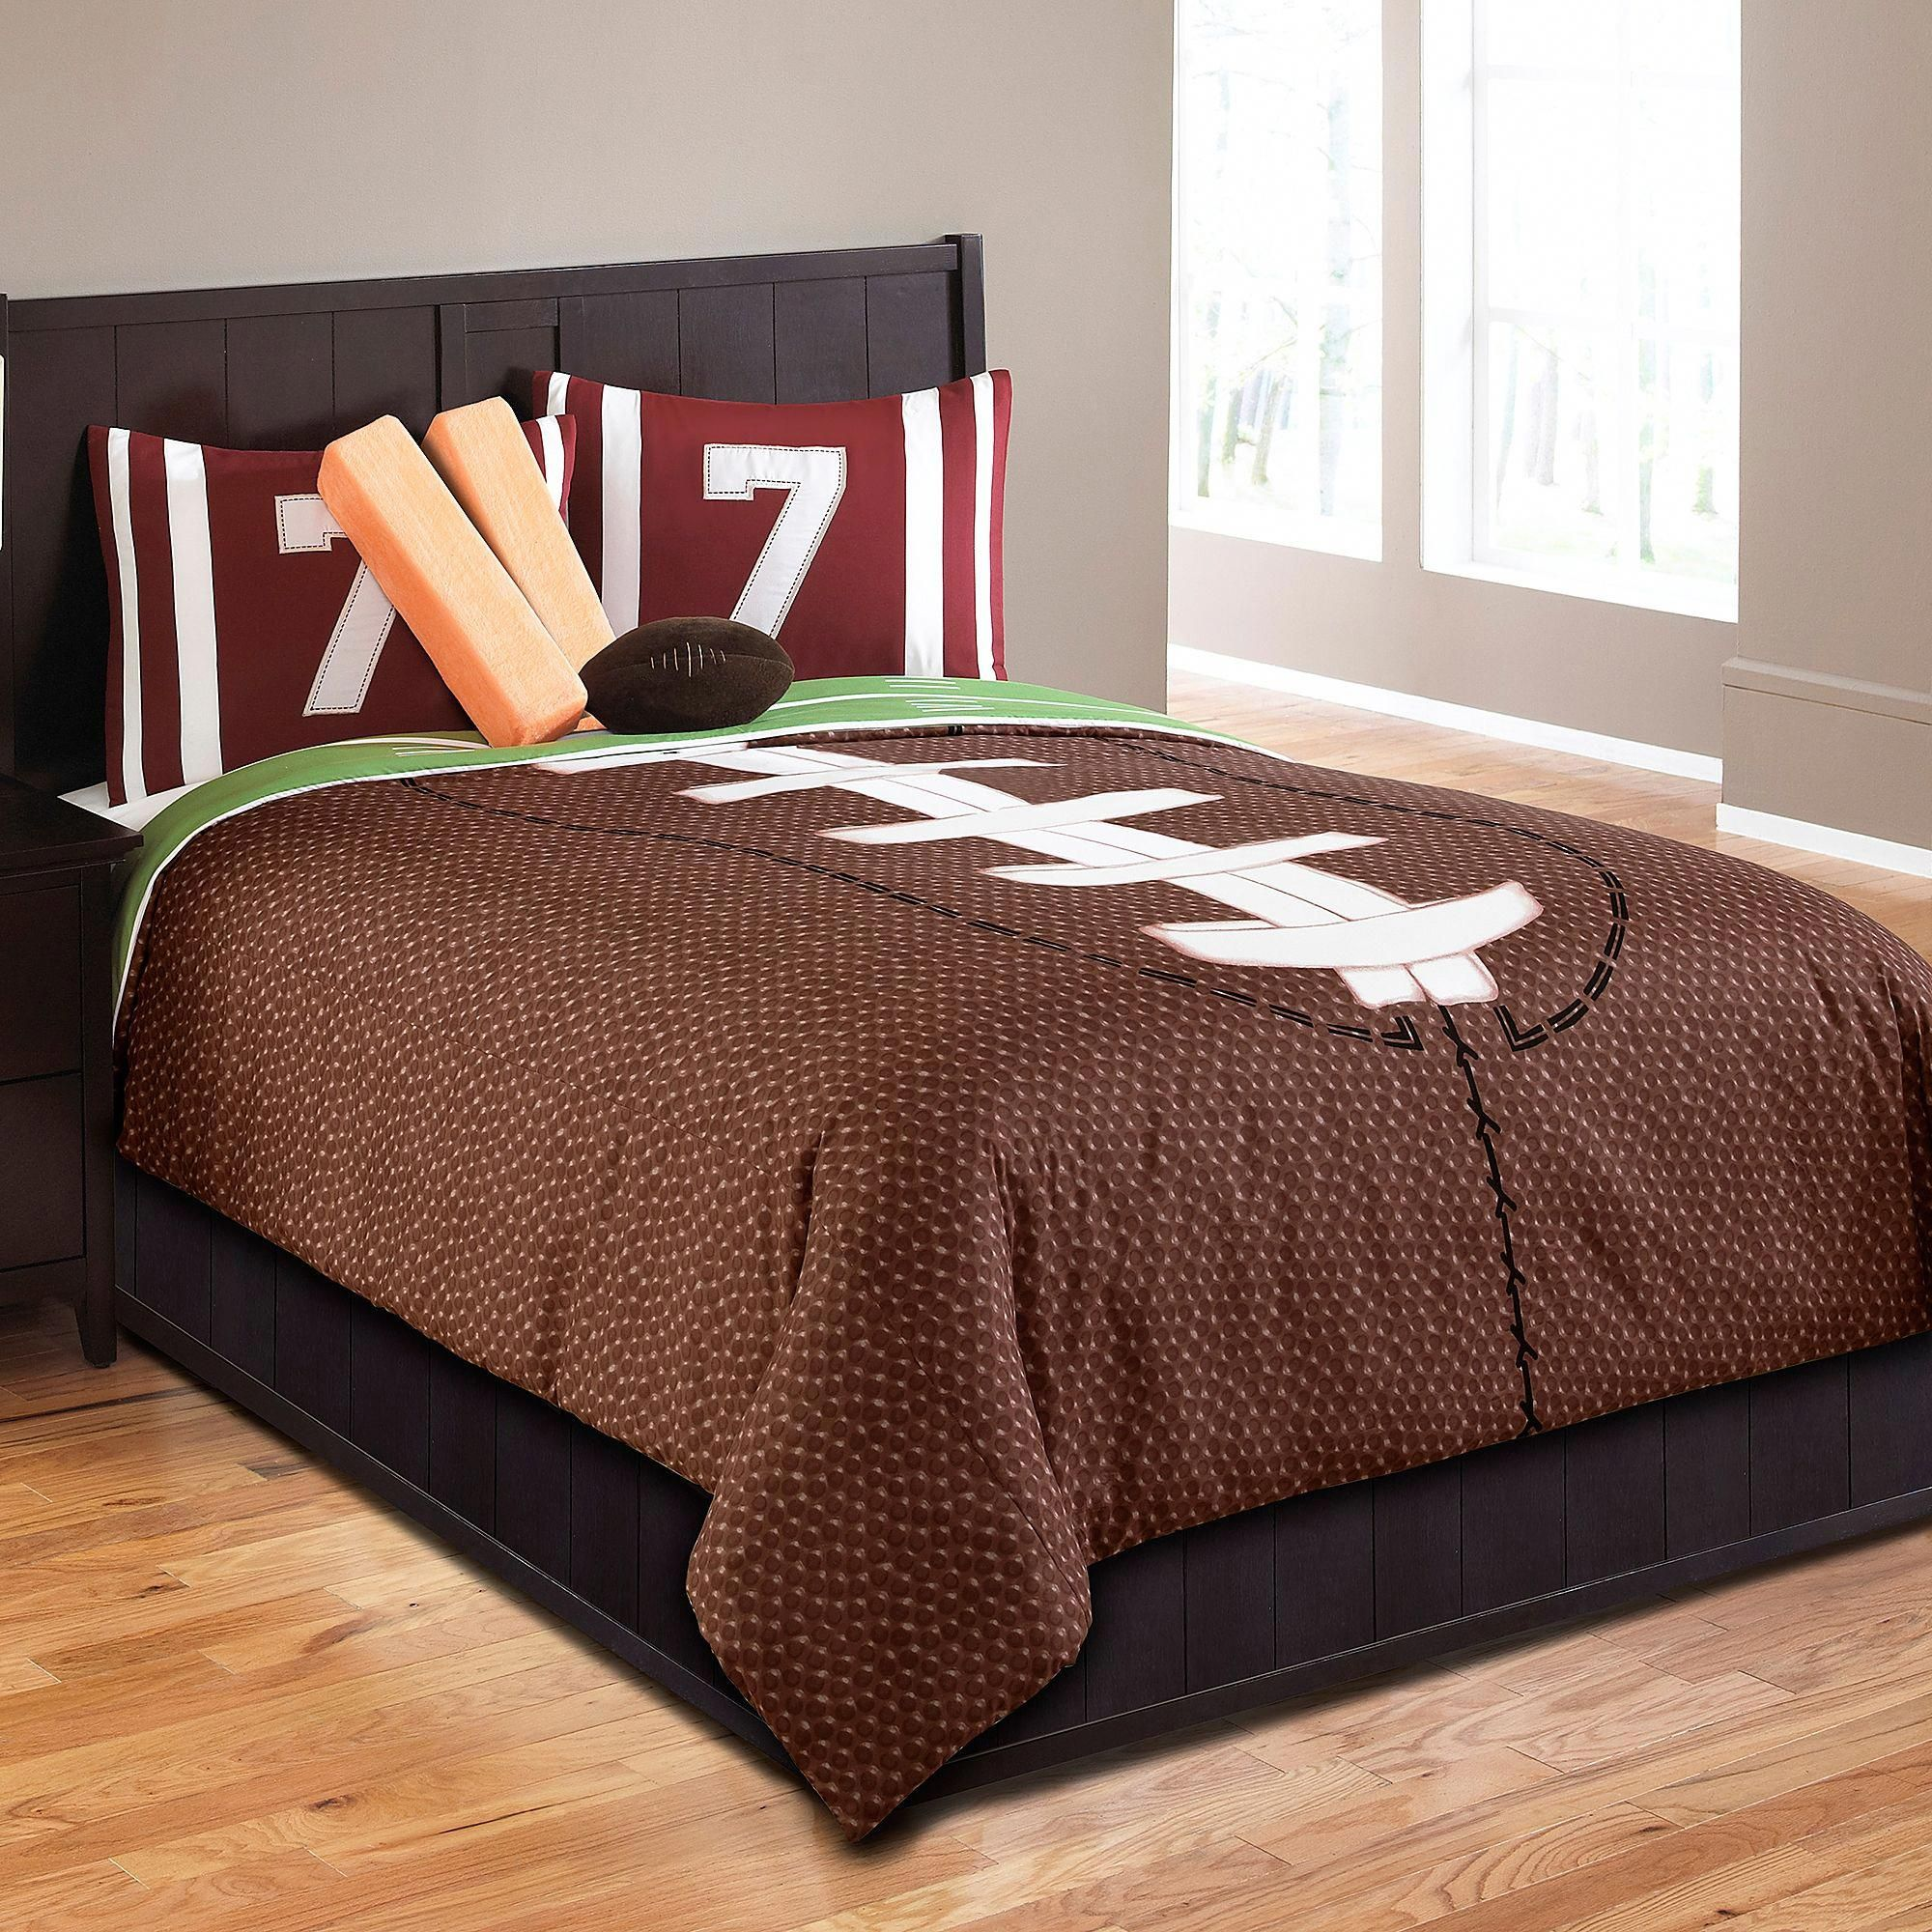 Will Washing Bedding Kill Fleas Sportsbedding Comforter Sets Sports Bedding Boys Comforter Sets